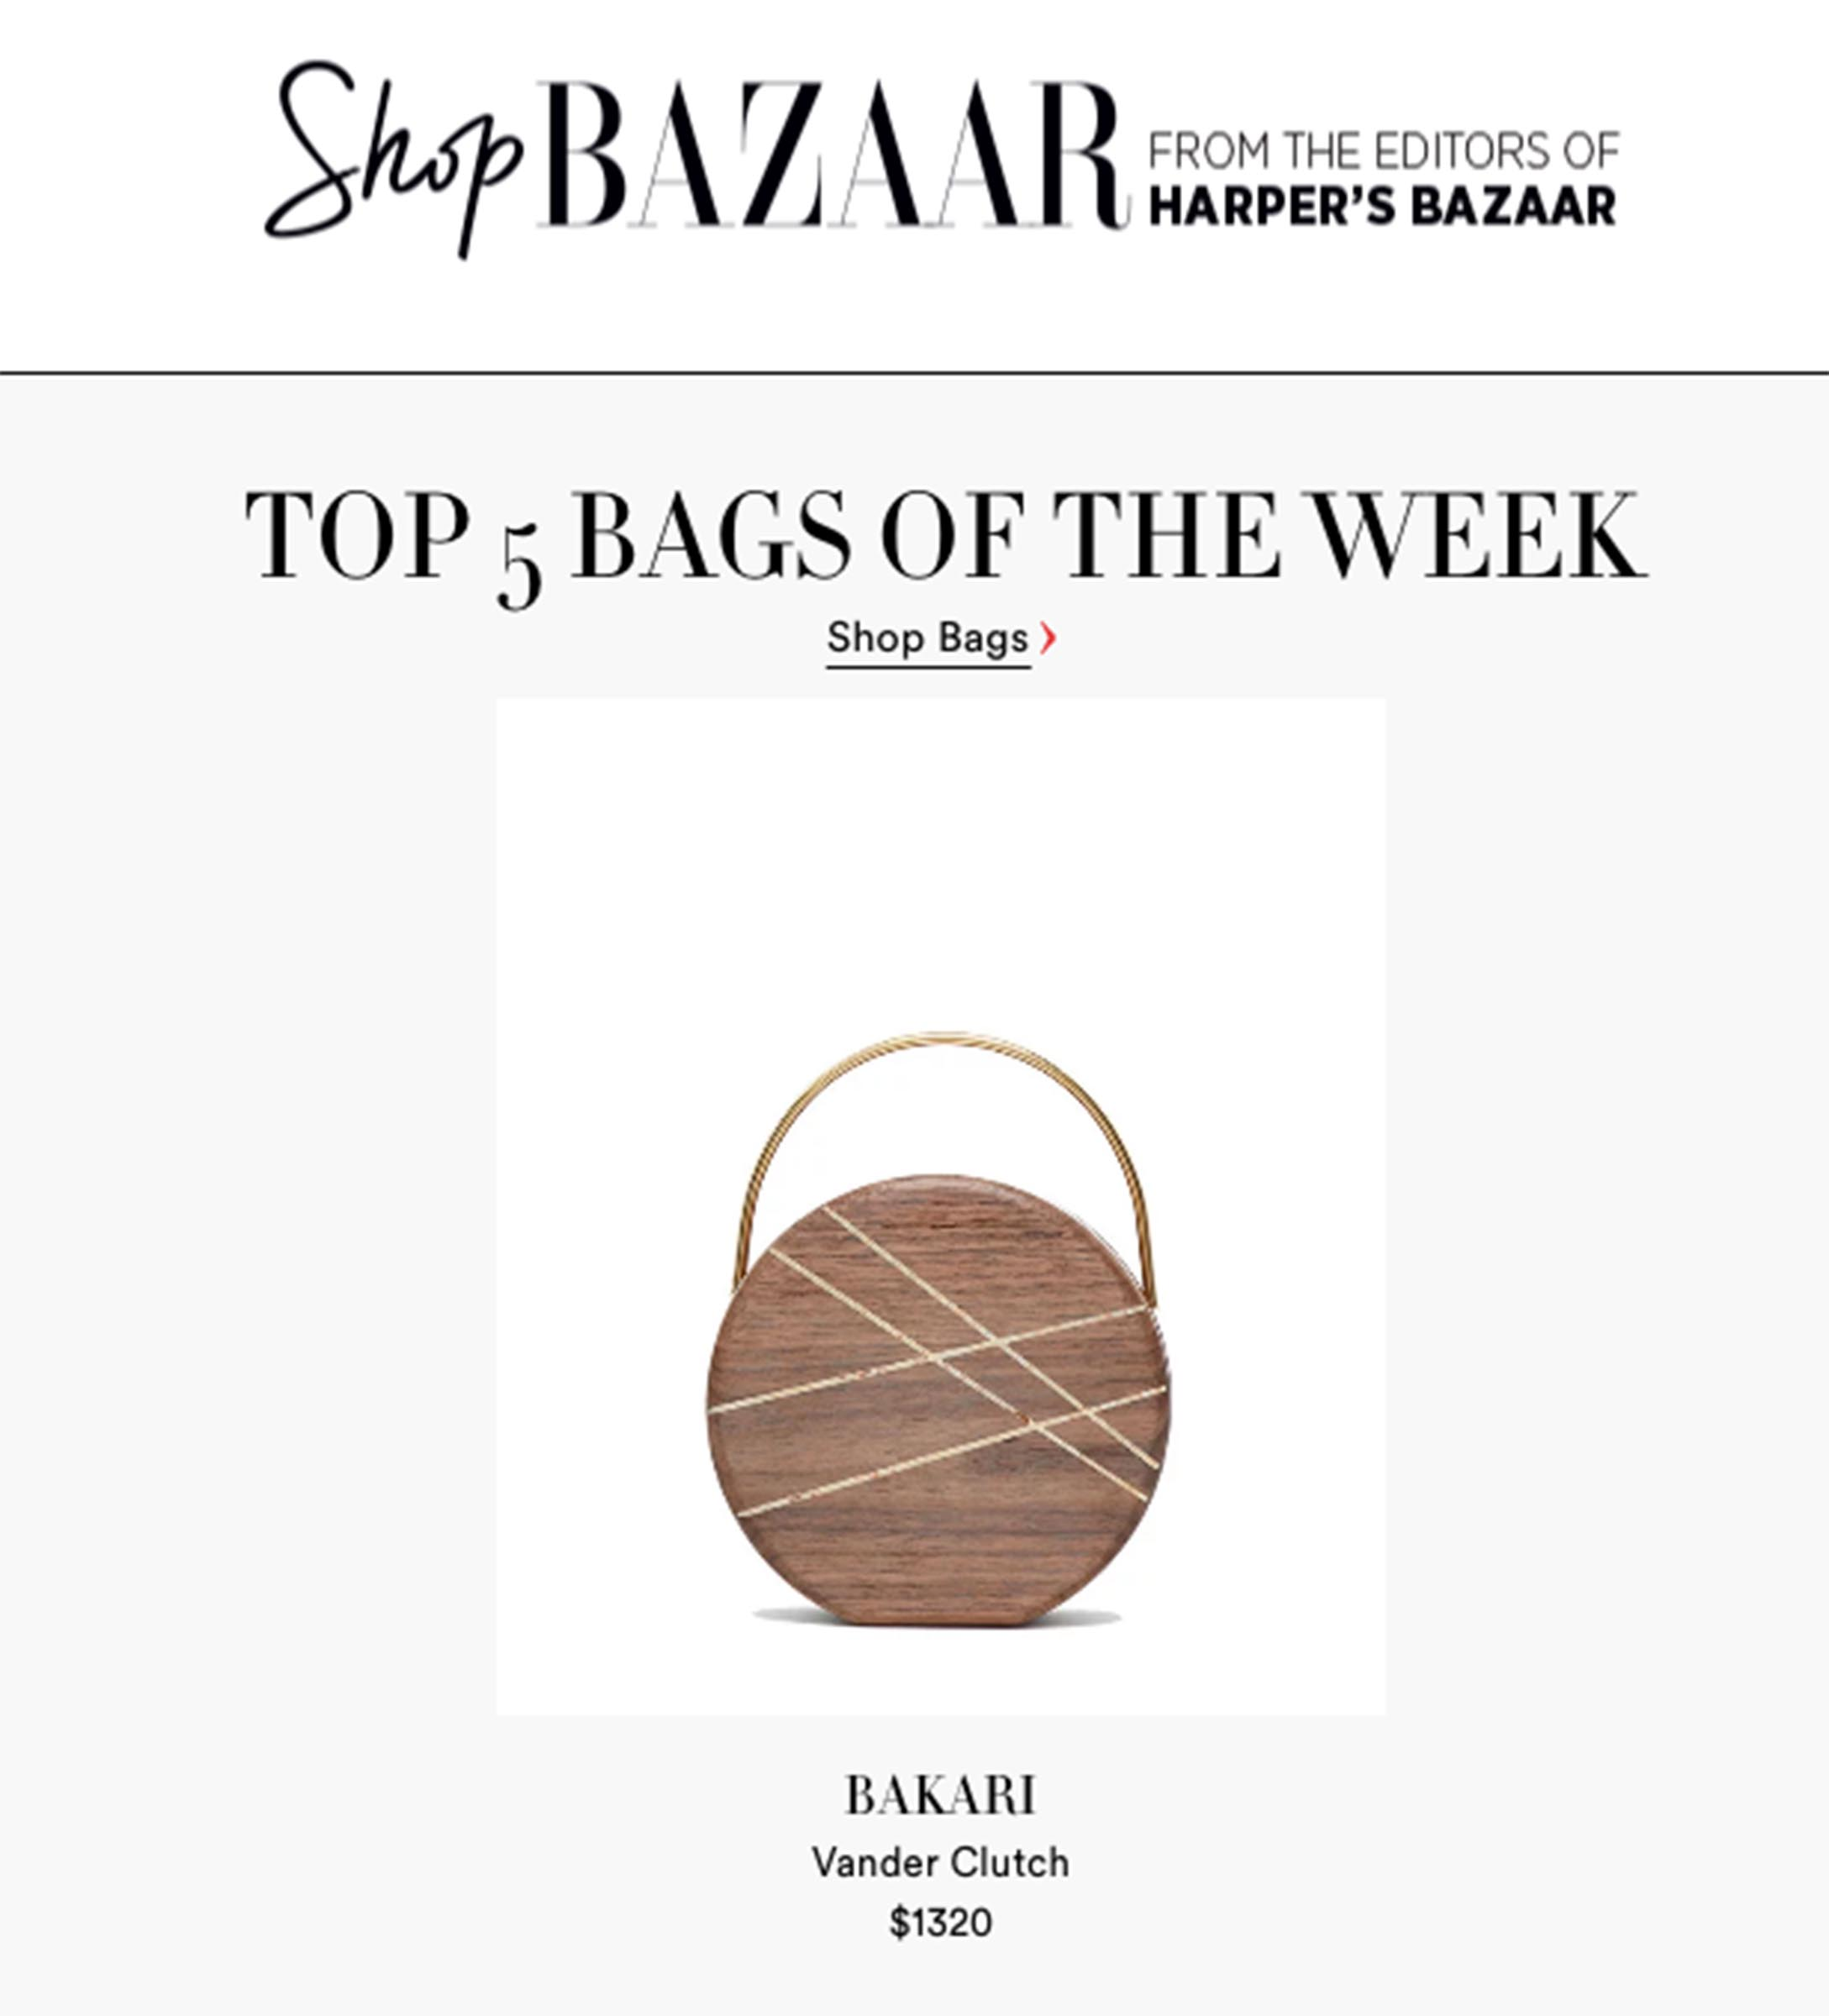 1.17.19 SHOPBazaar.com BAKARI 2.jpg